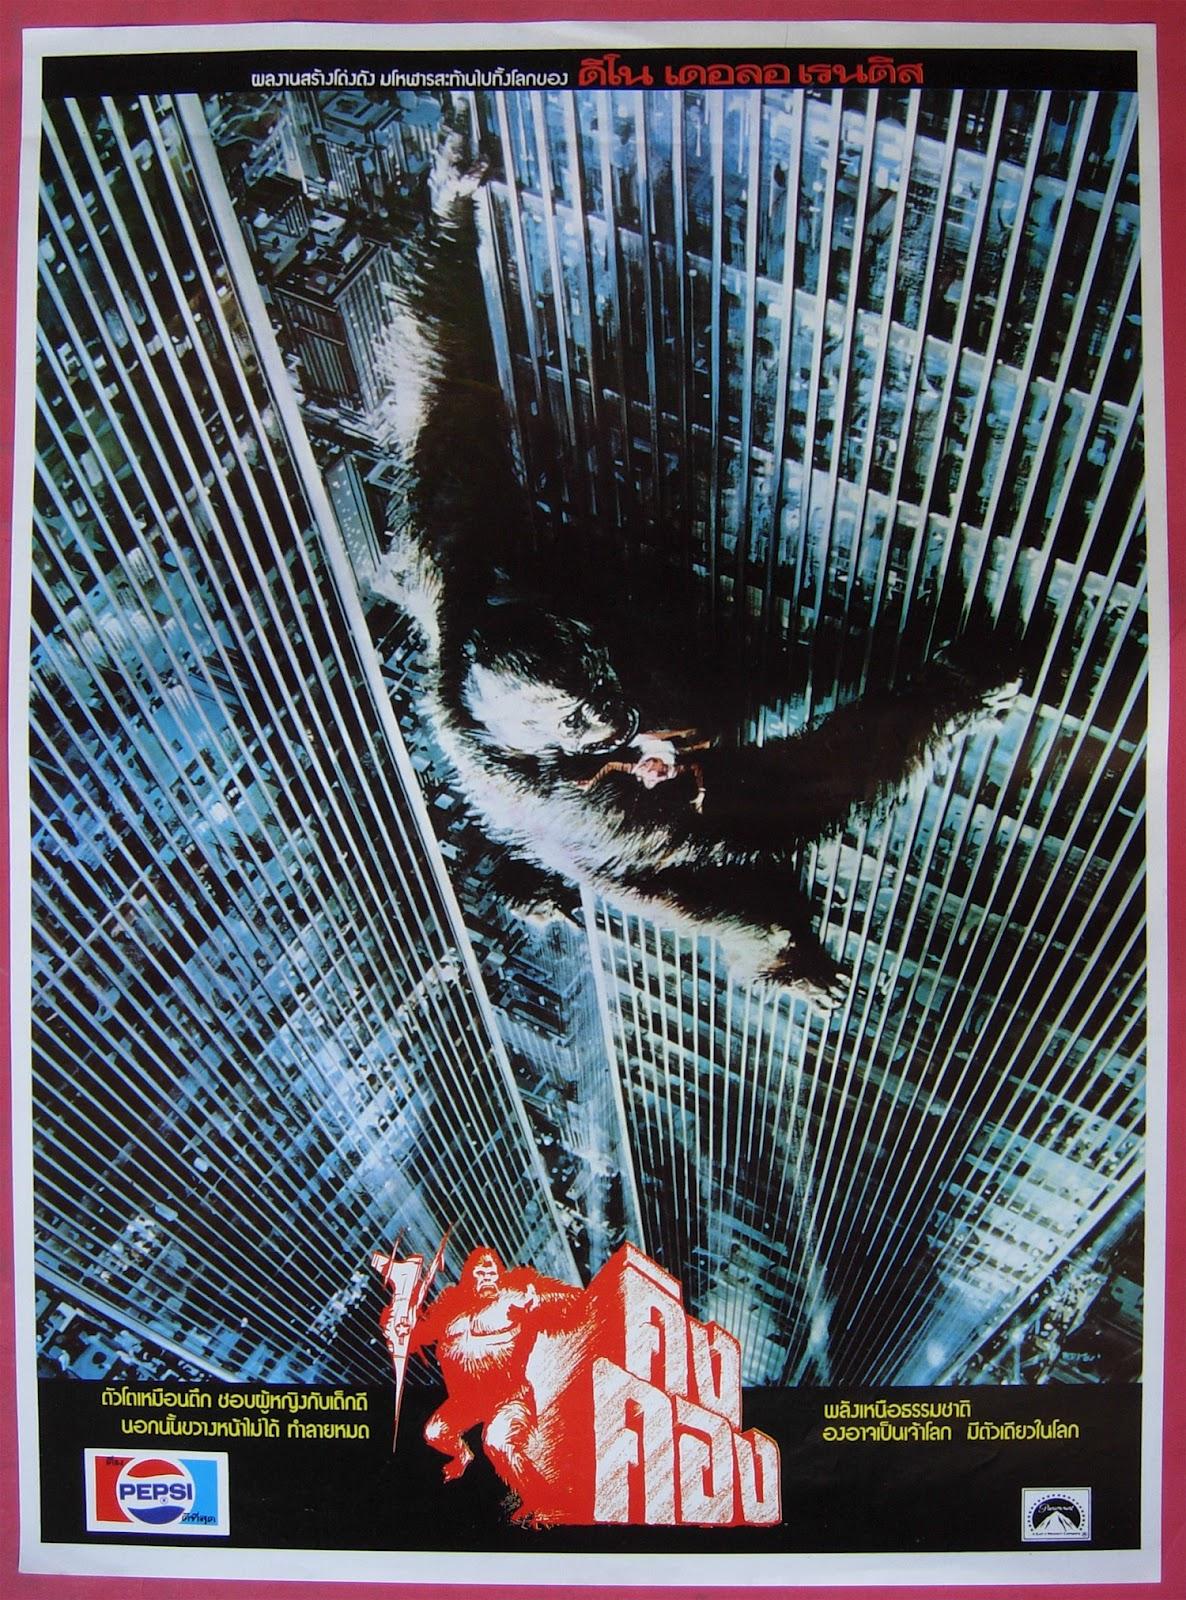 king kong movie posters at movie poster warehouse